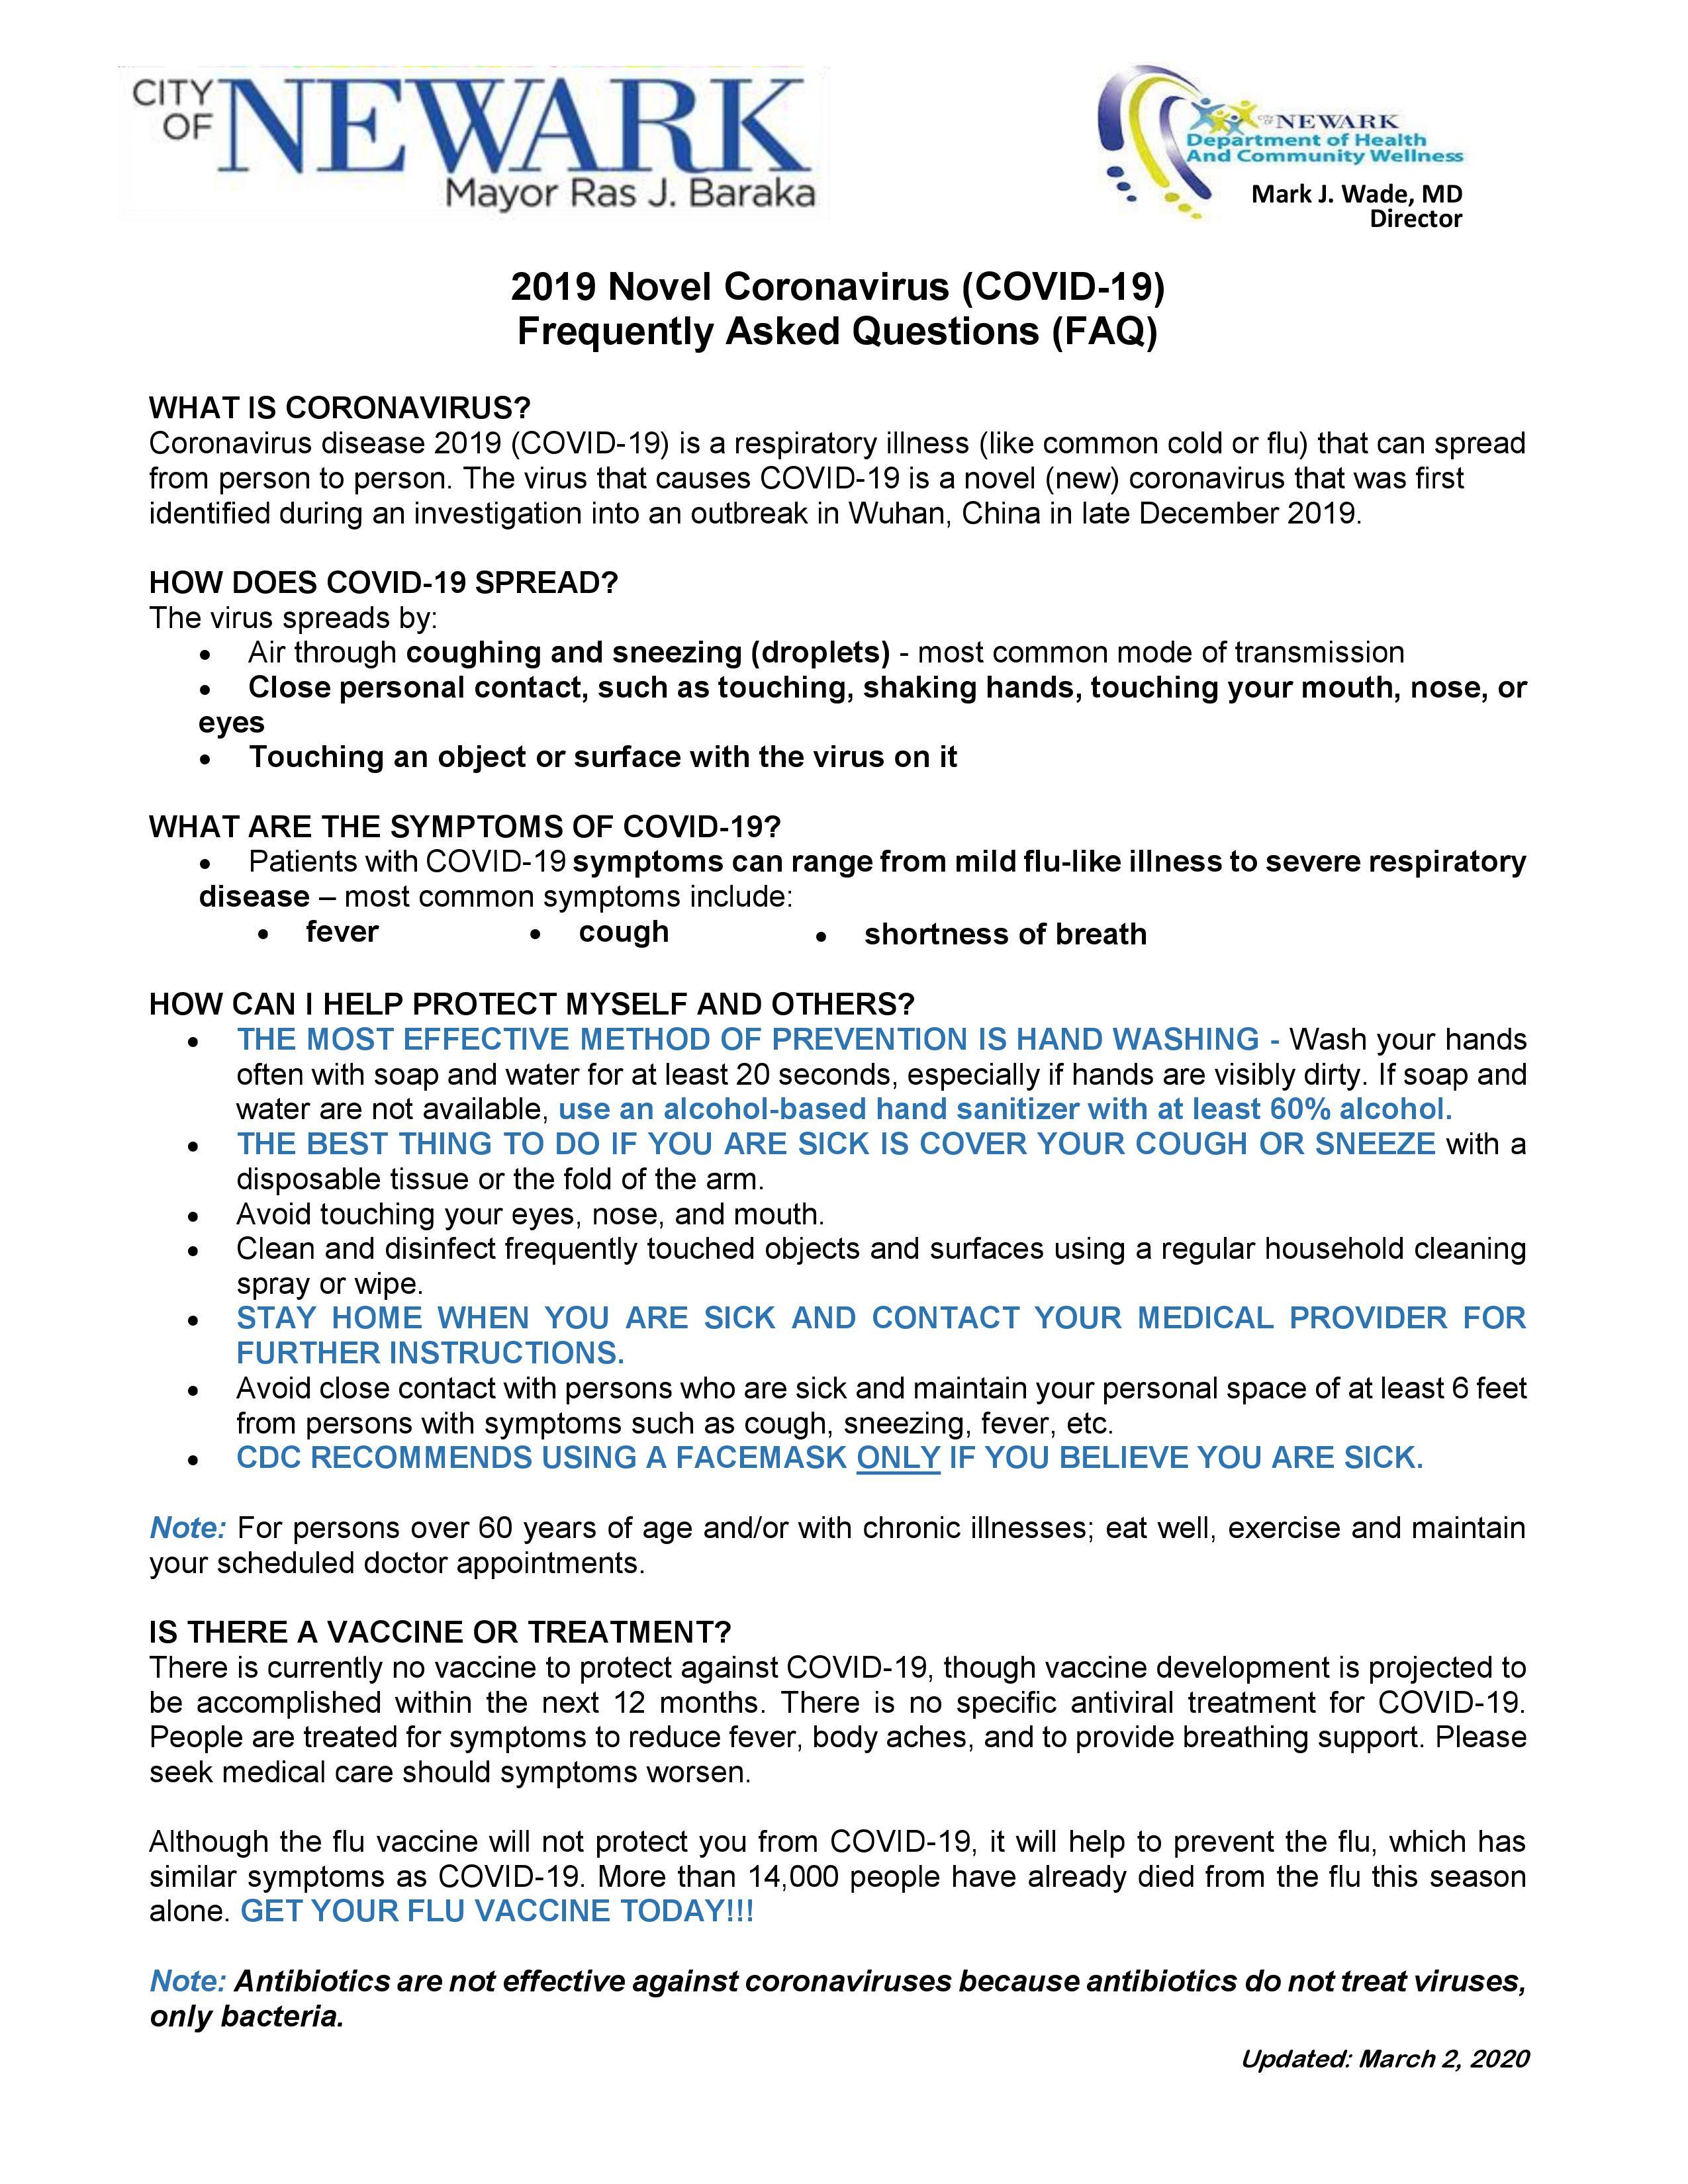 News: INFORMATION REGARDING COVID-19 (CORONAVIRUS)